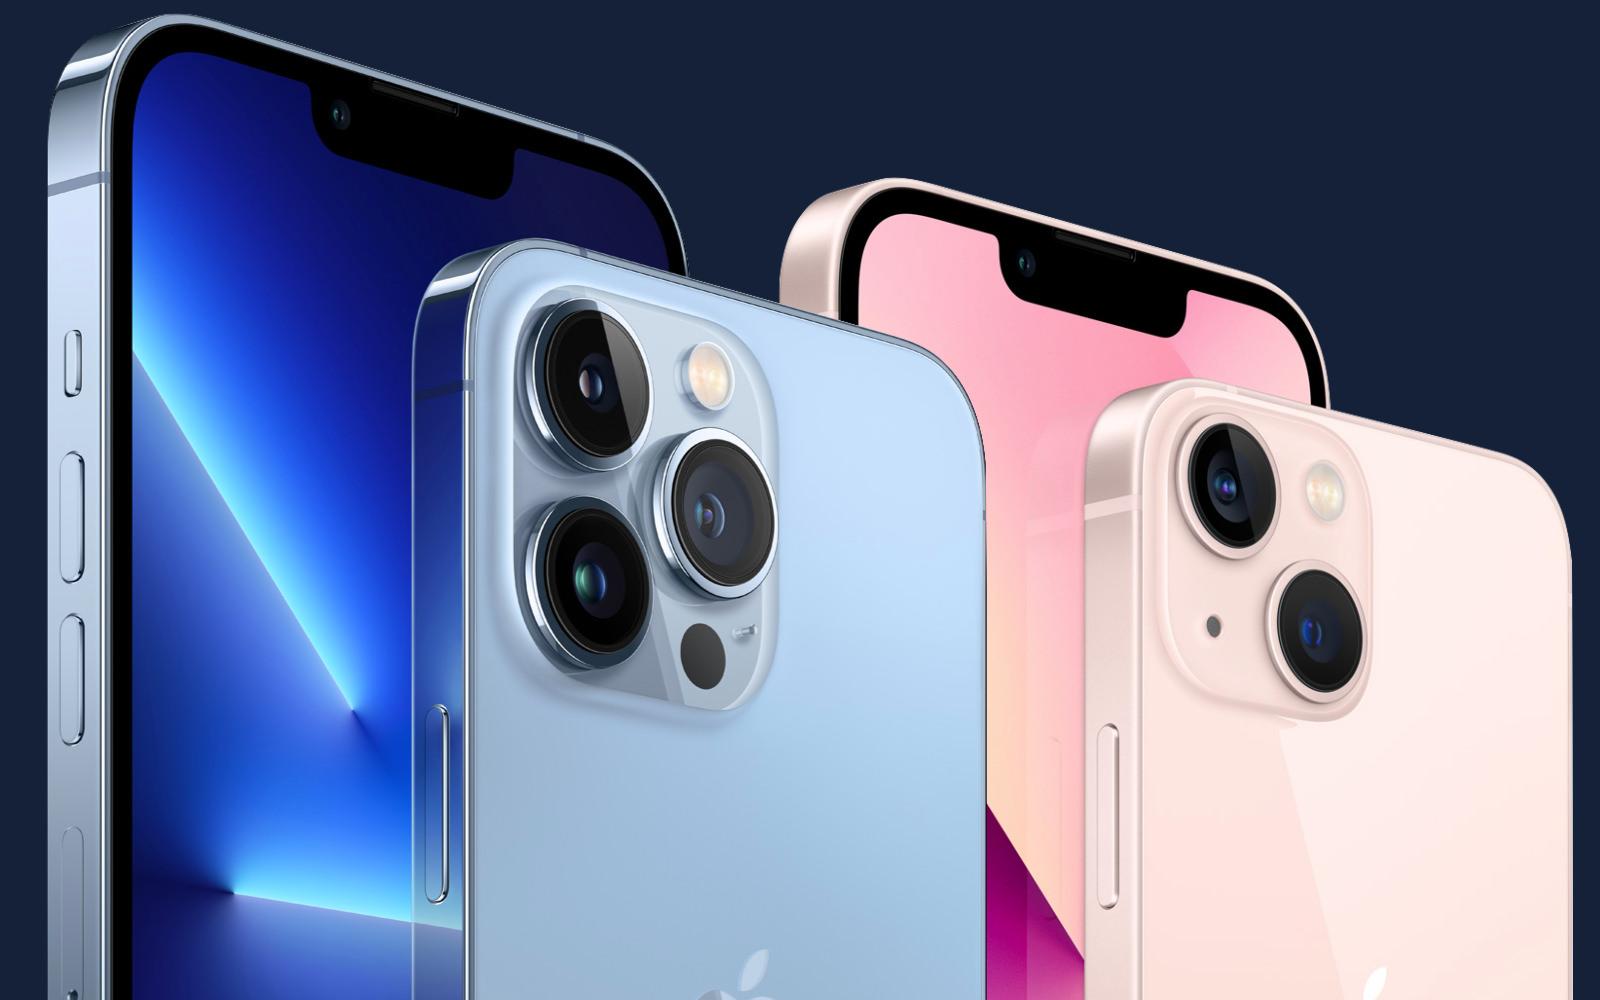 Iphone13 13pro series